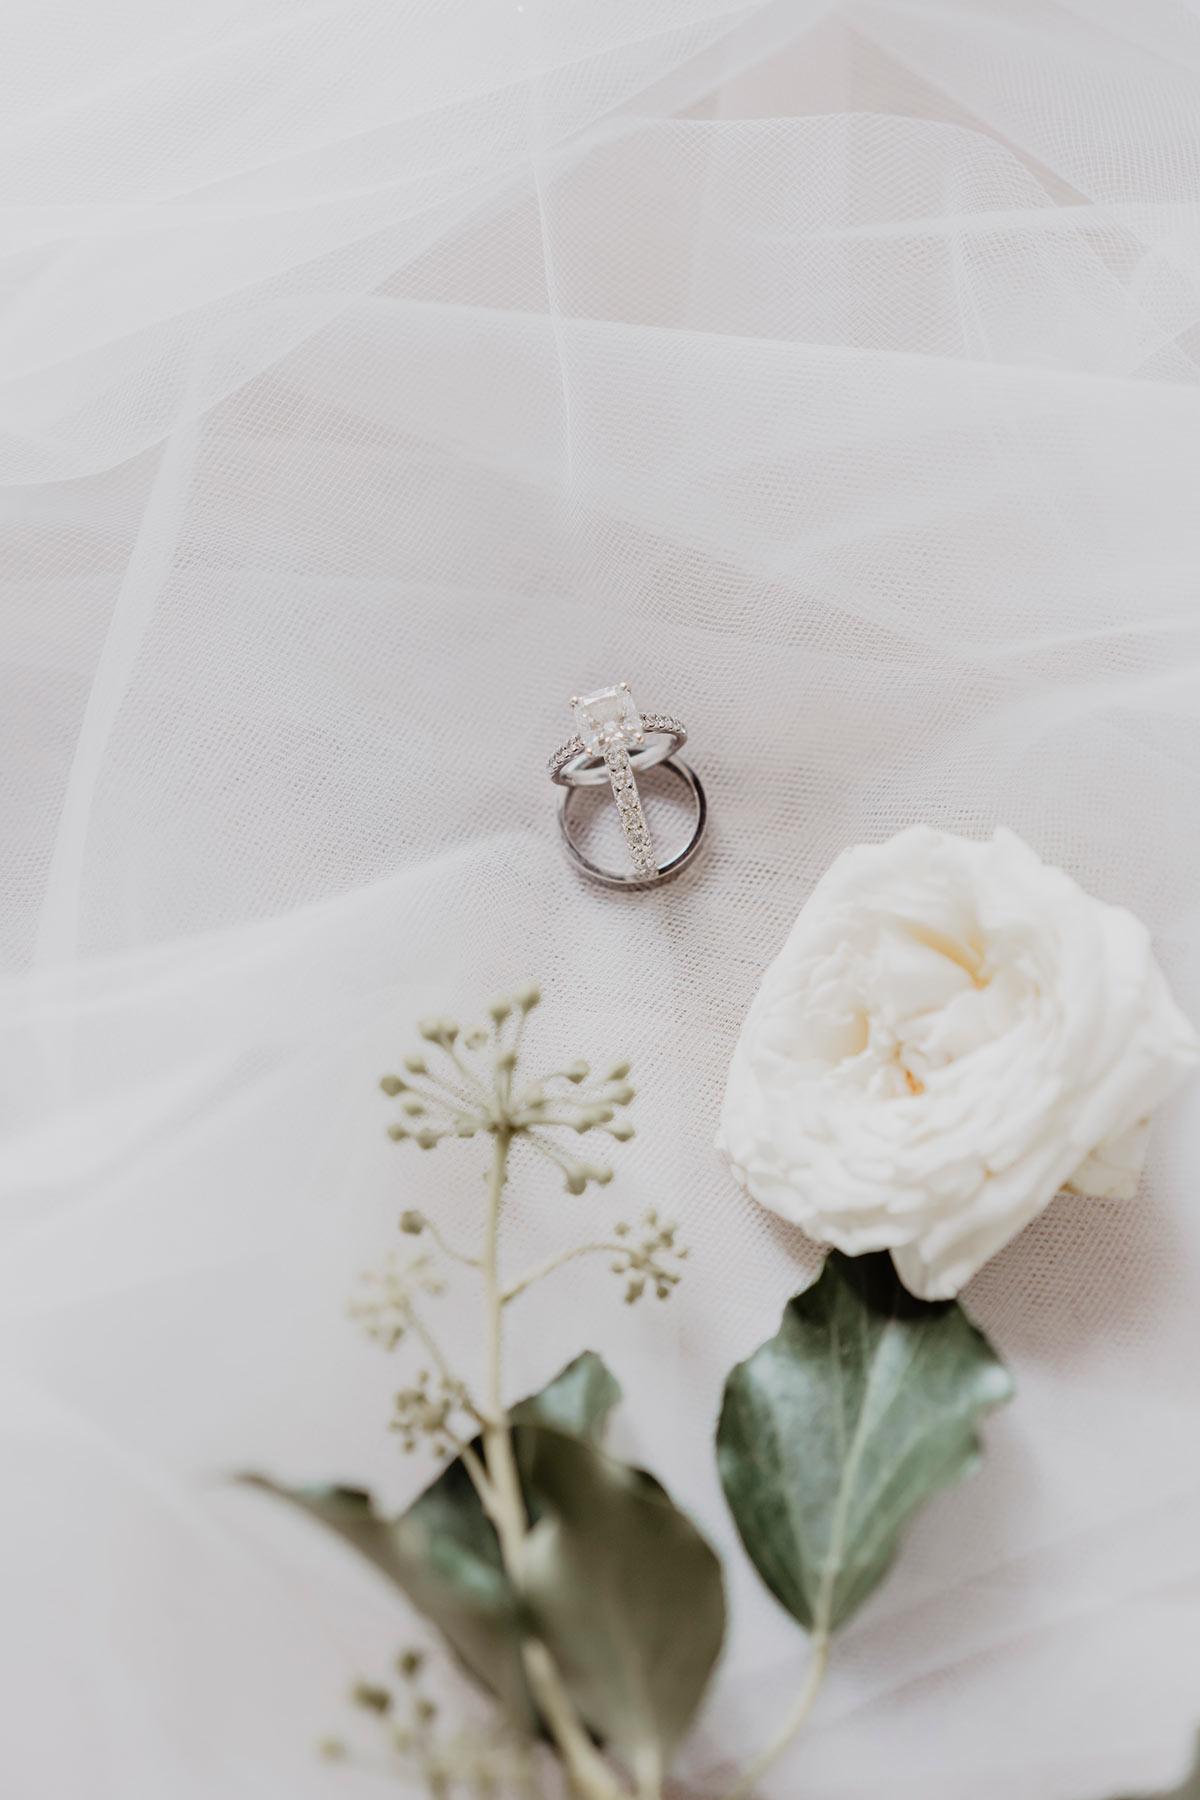 Ranya and Tarek, wedding jewel detail